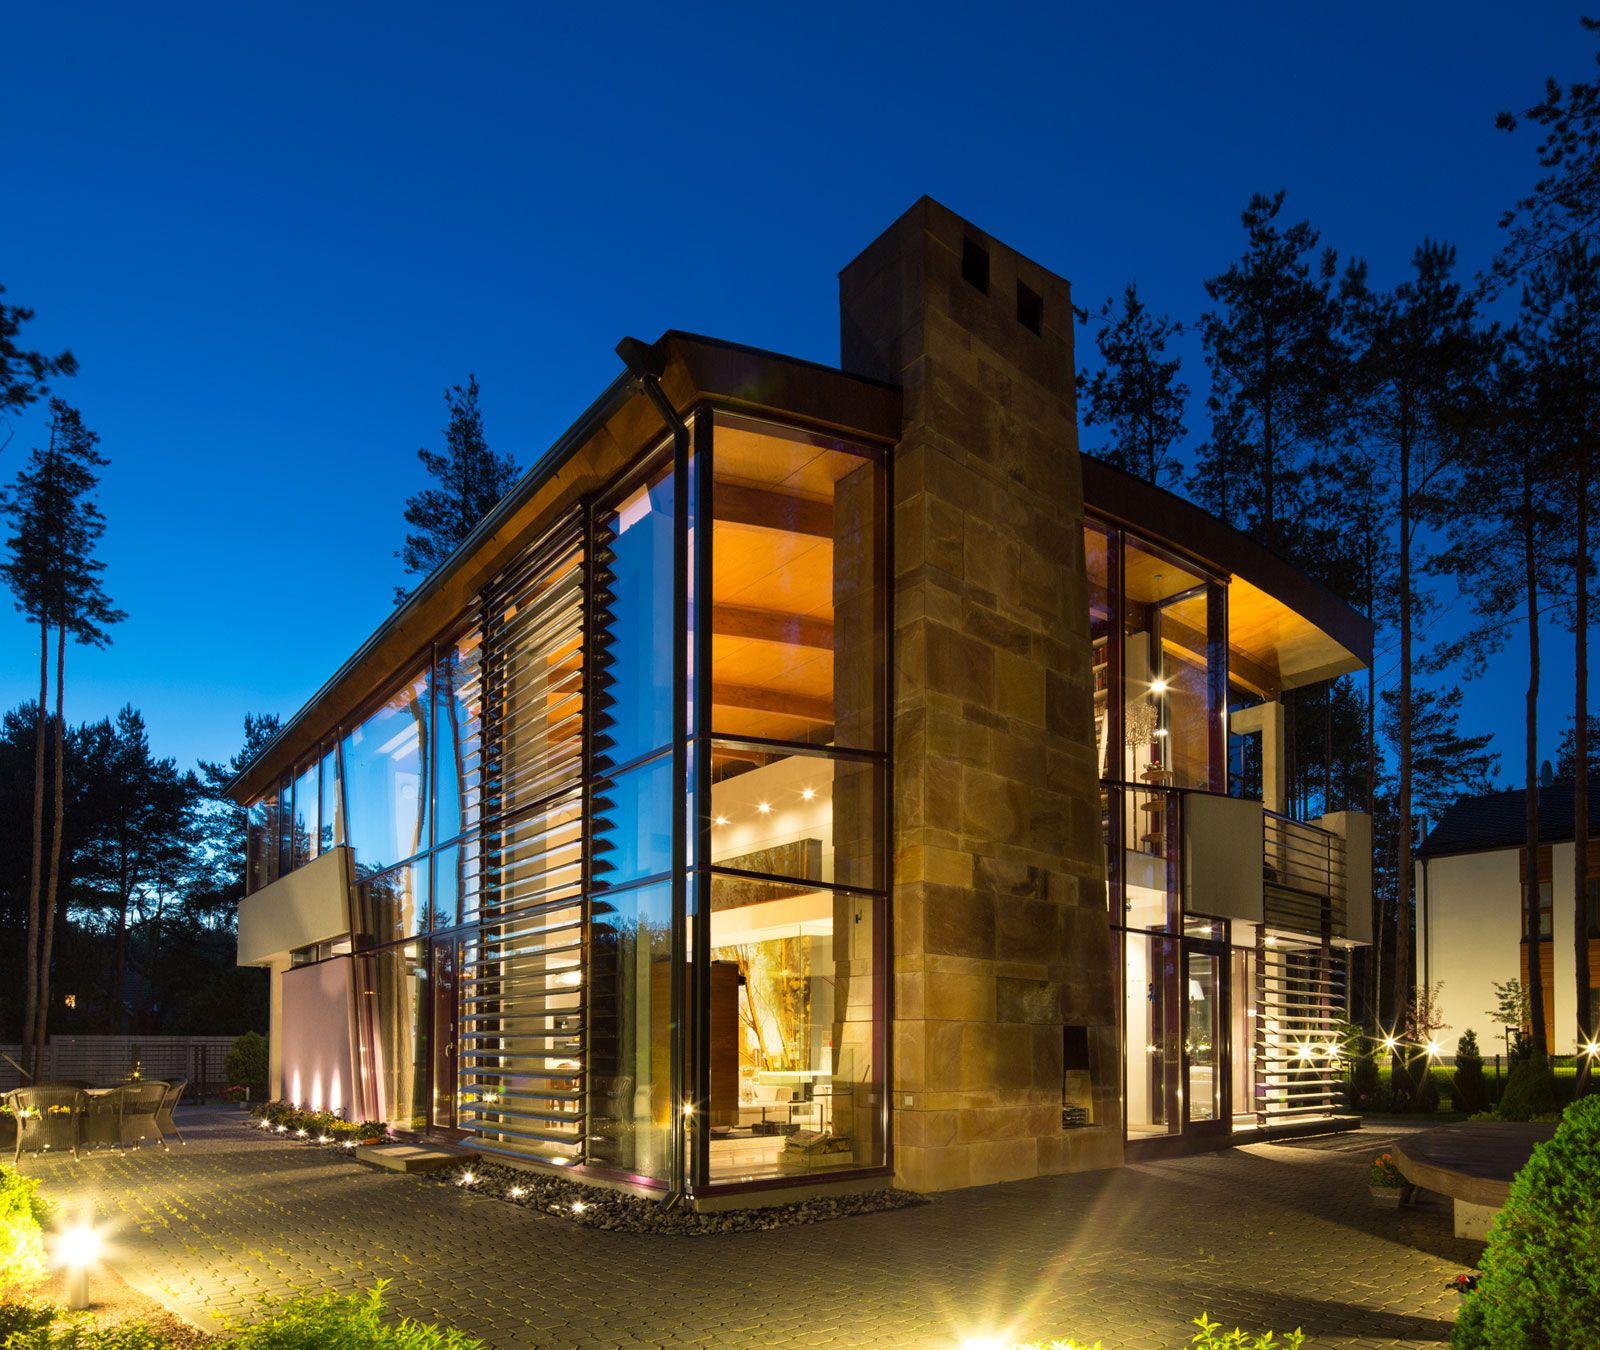 Ultramodern Villa Estebania Near the Forrest by Arch-D-14